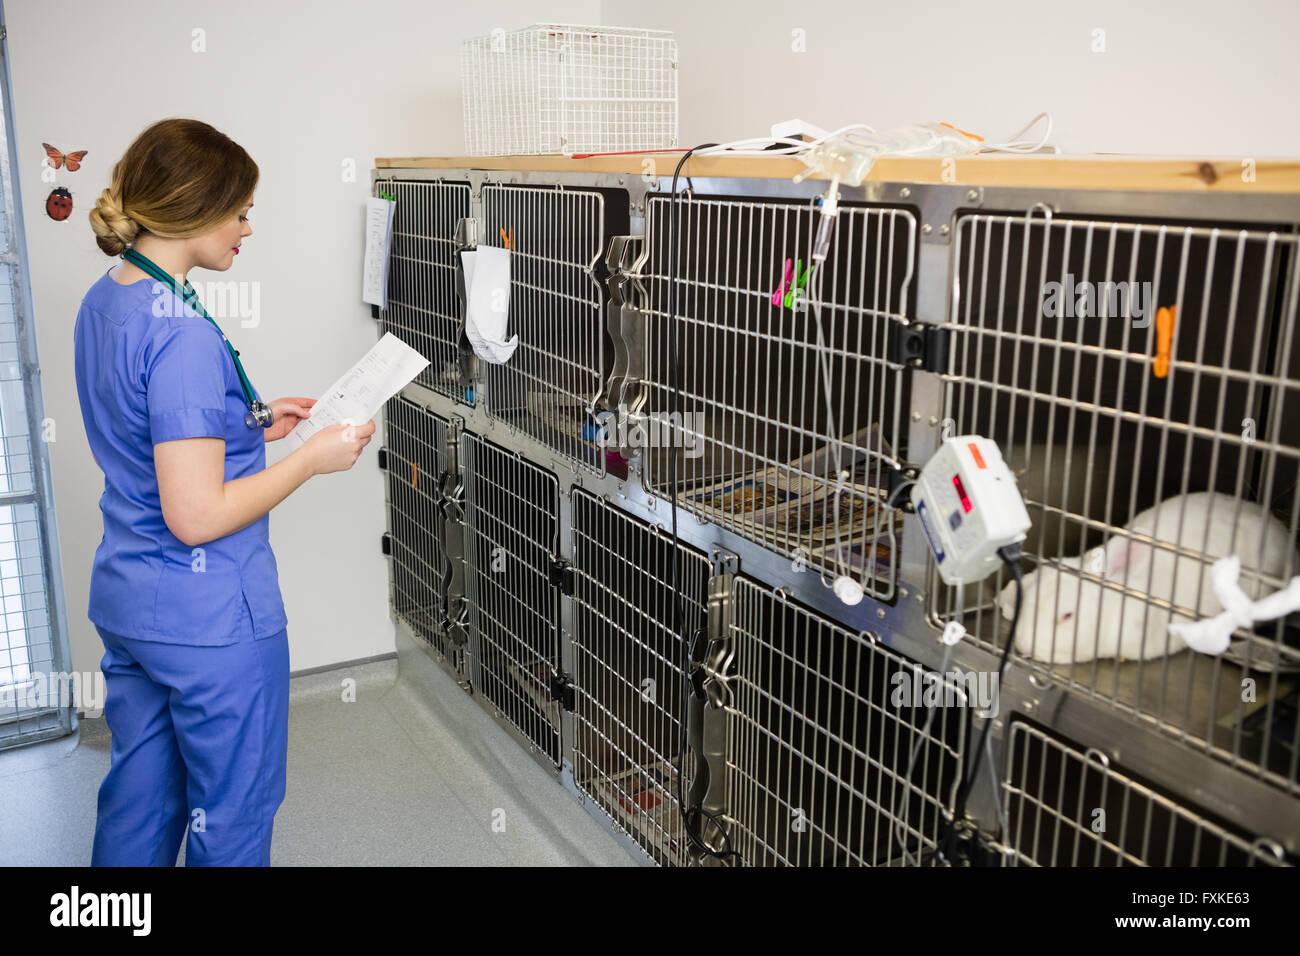 Vet Monitoring Sick Rabbit In Cage Stock Photo 102461131 Alamy